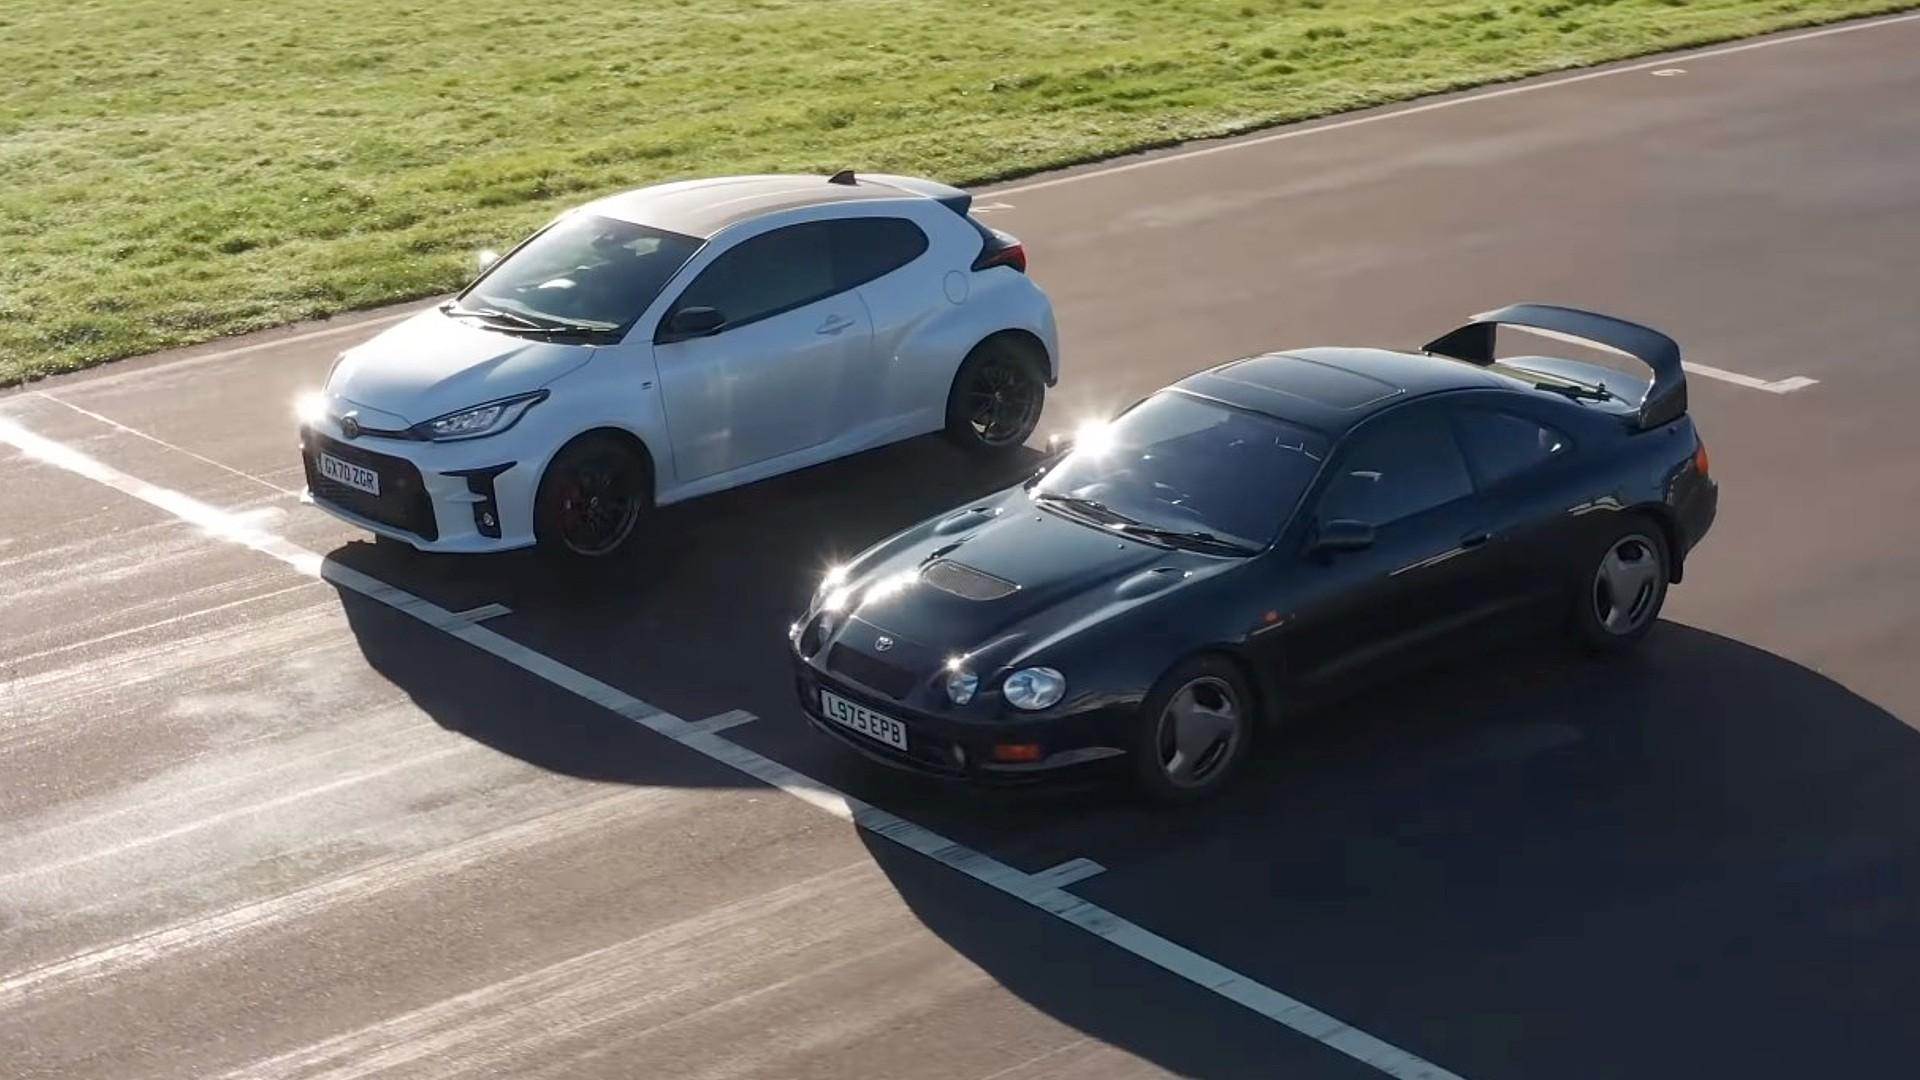 Toyota GR Yaris εναντίον Celica GT-Four ST205 στην πίστα [vid]